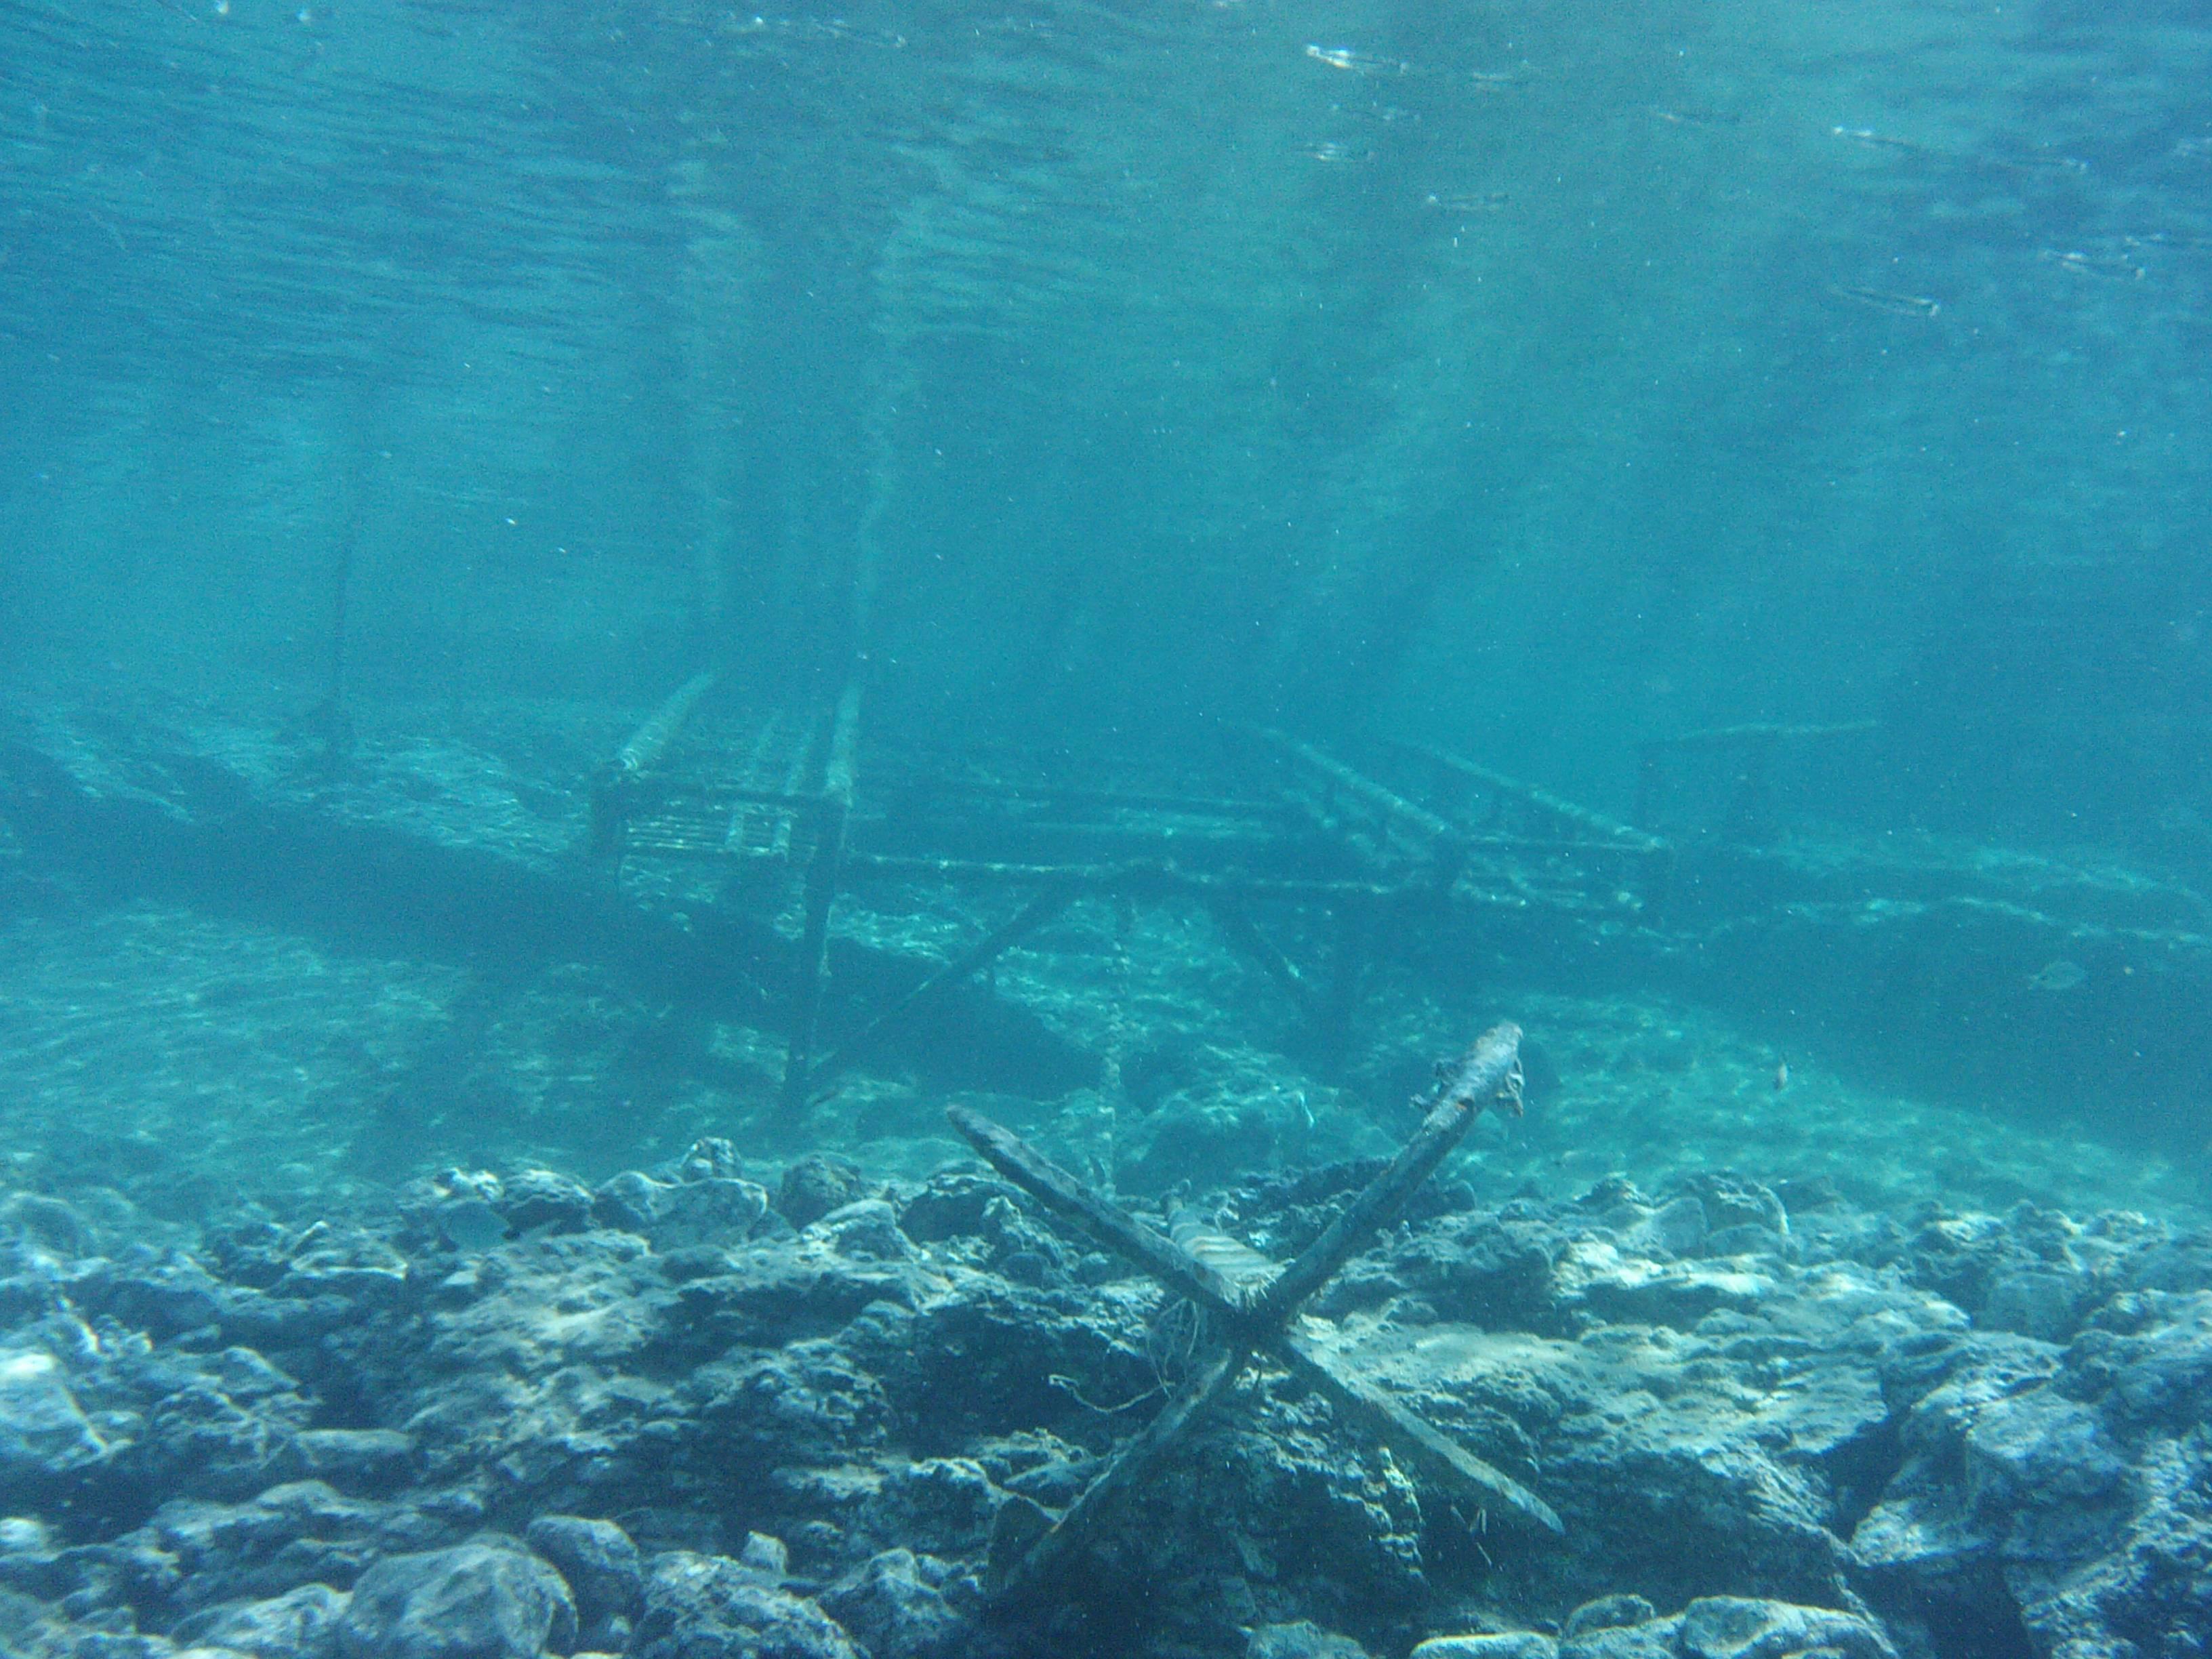 adenan hd wallpaper underwater - photo #1